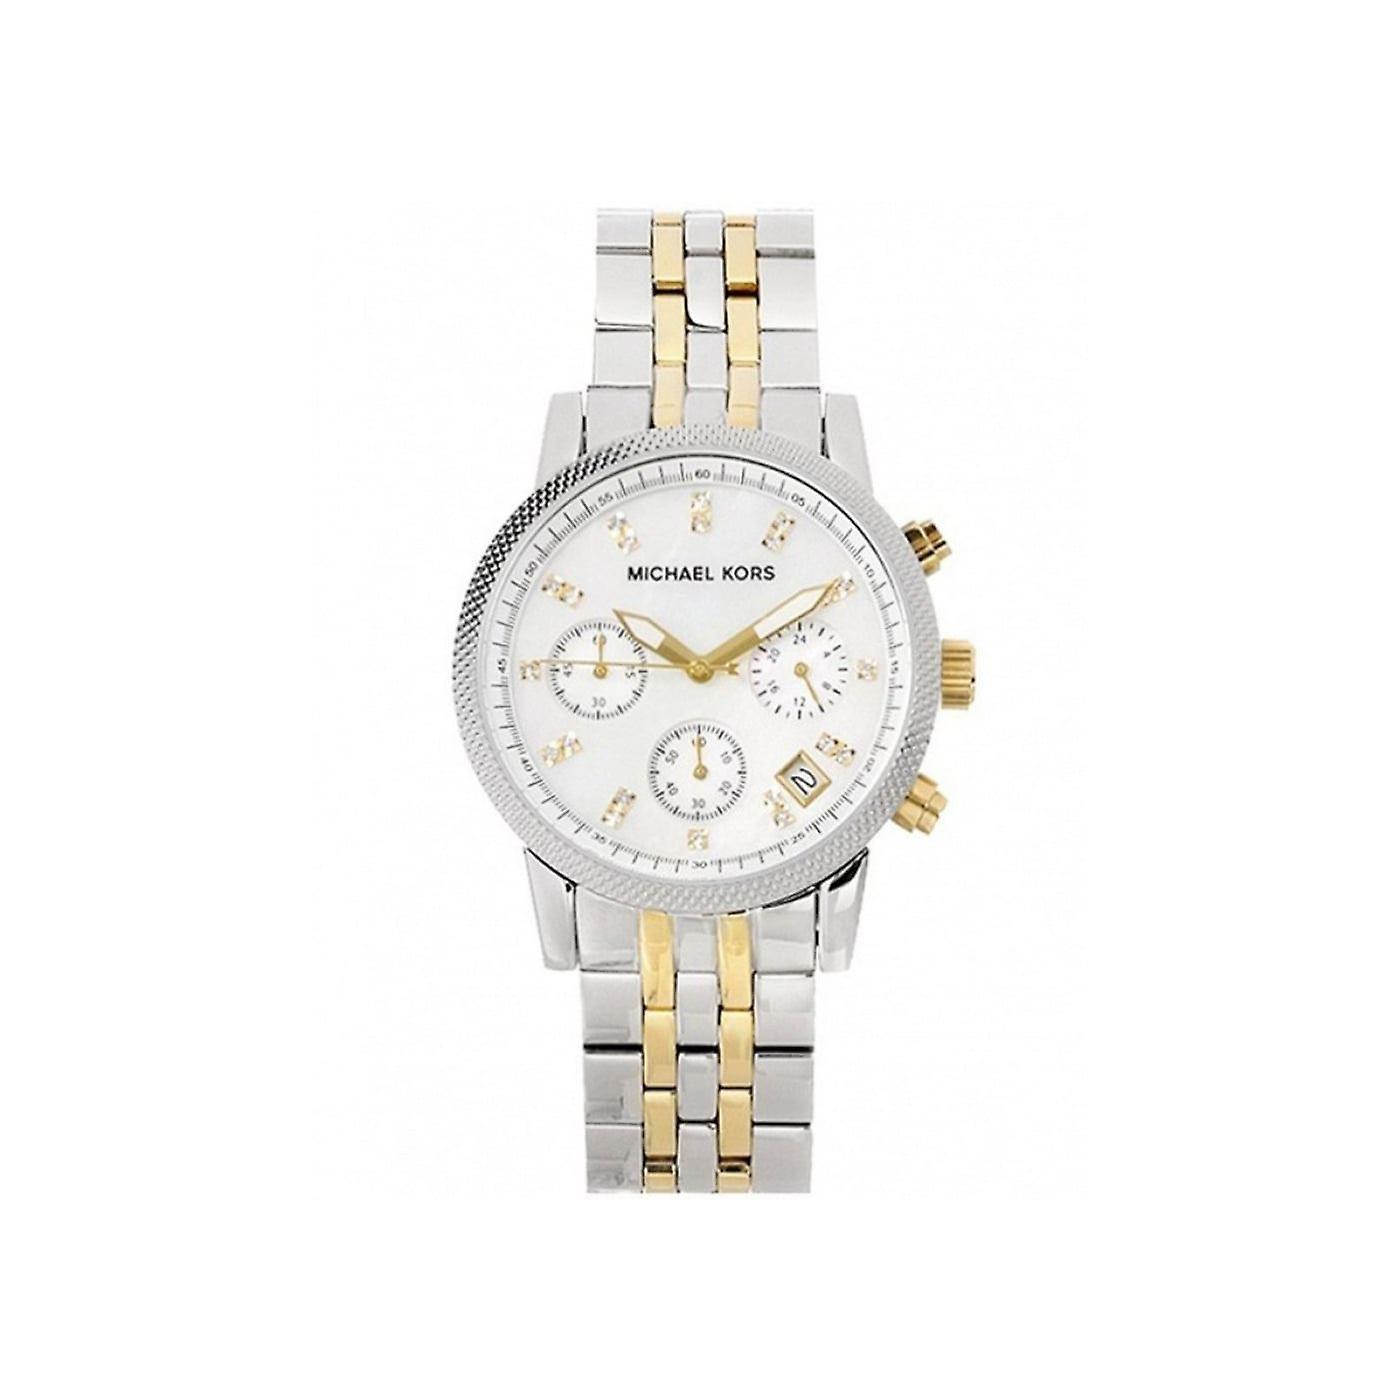 Michael Kors Ladies Watch MK5057   Fruugo 4f55f5e068